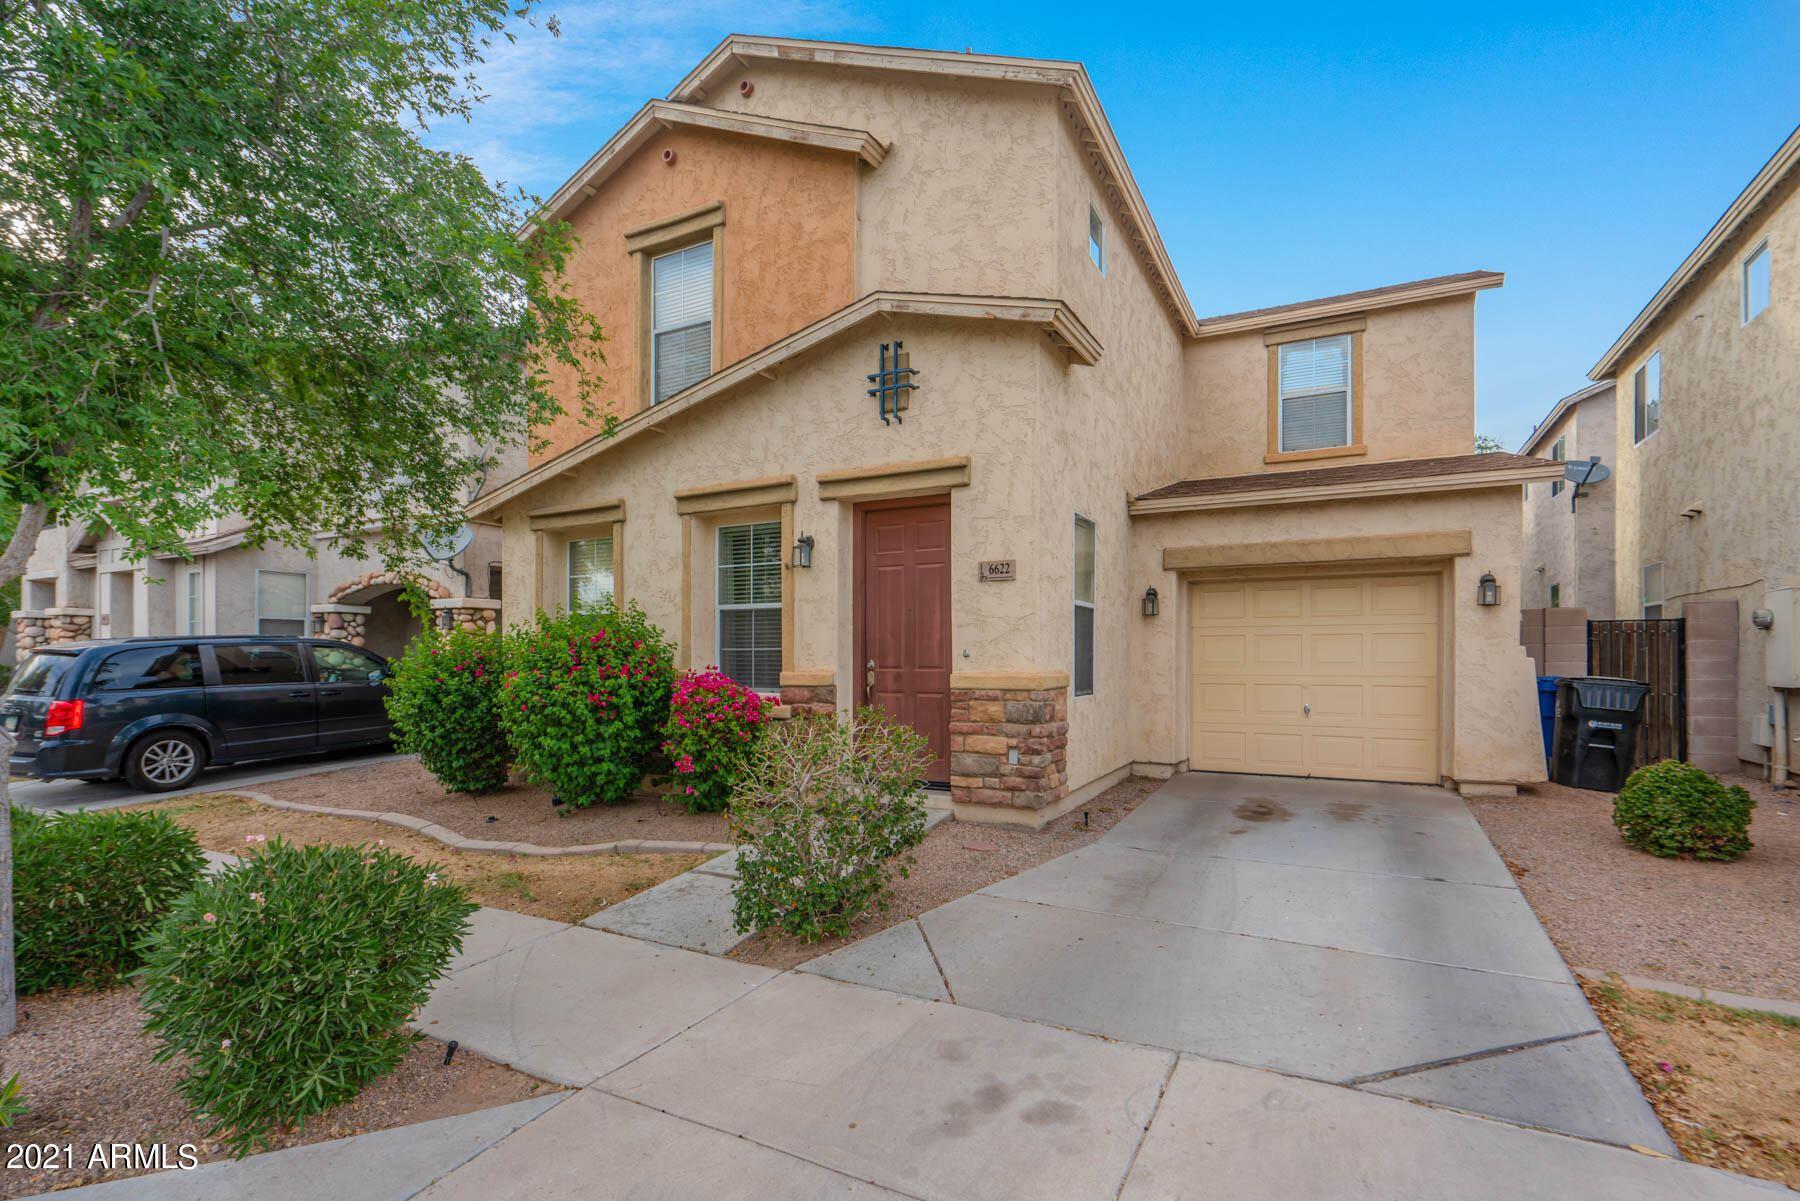 6622 W TAYLOR Street, Phoenix, AZ 85043 - MLS#: 6248089